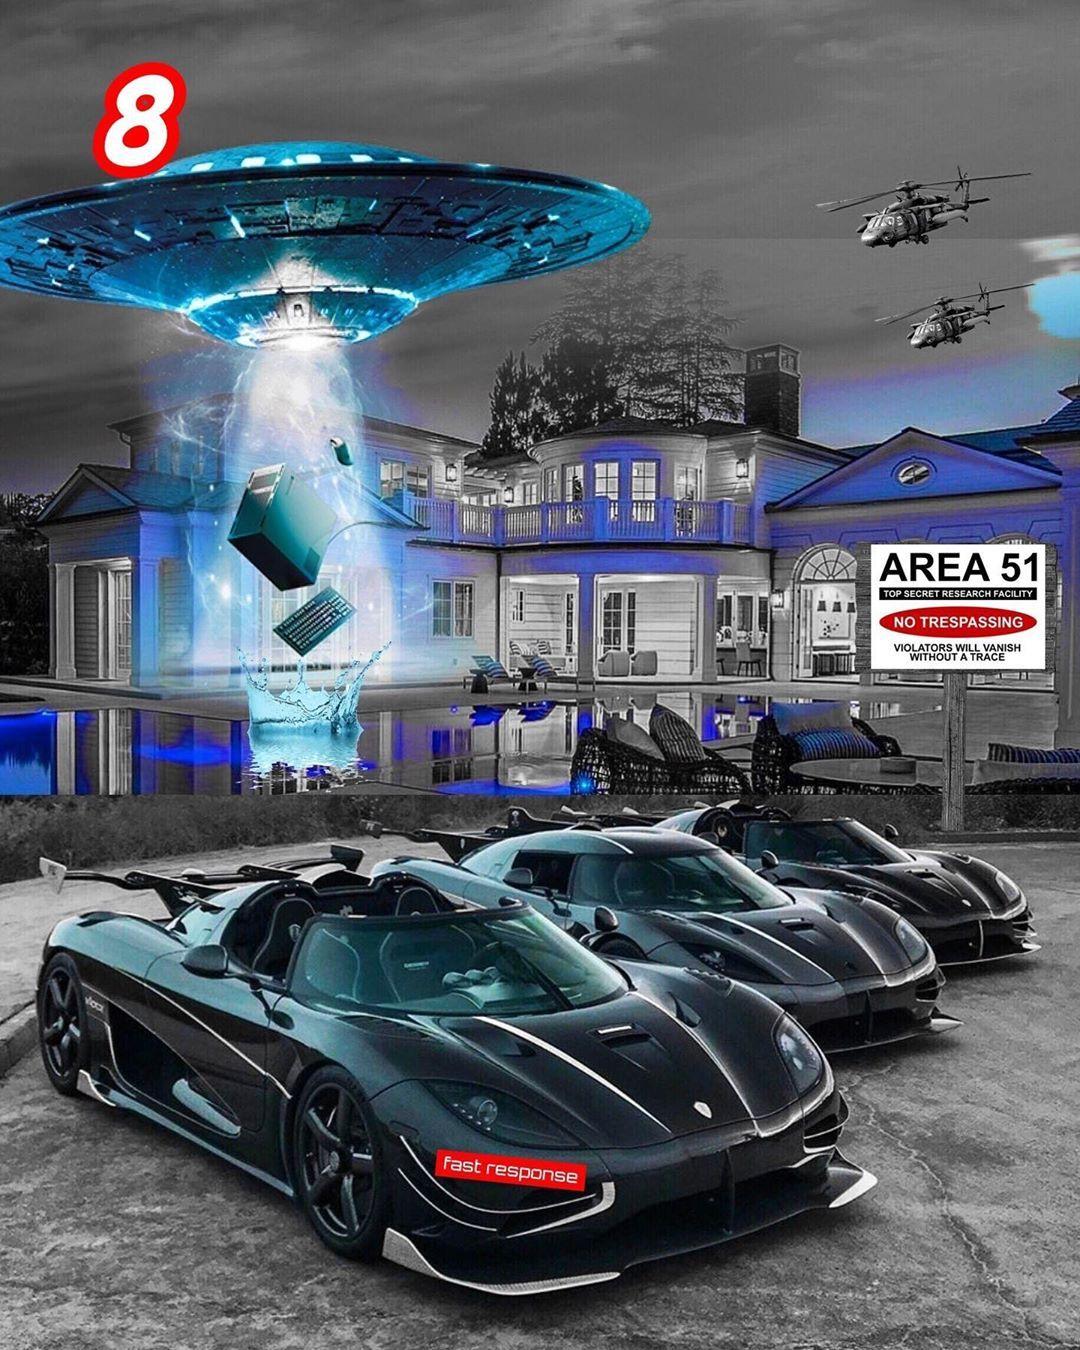 L�ks arabalar Logo  #cars #luxurycars #sportcars #conceptcars #motorcycles #trucks